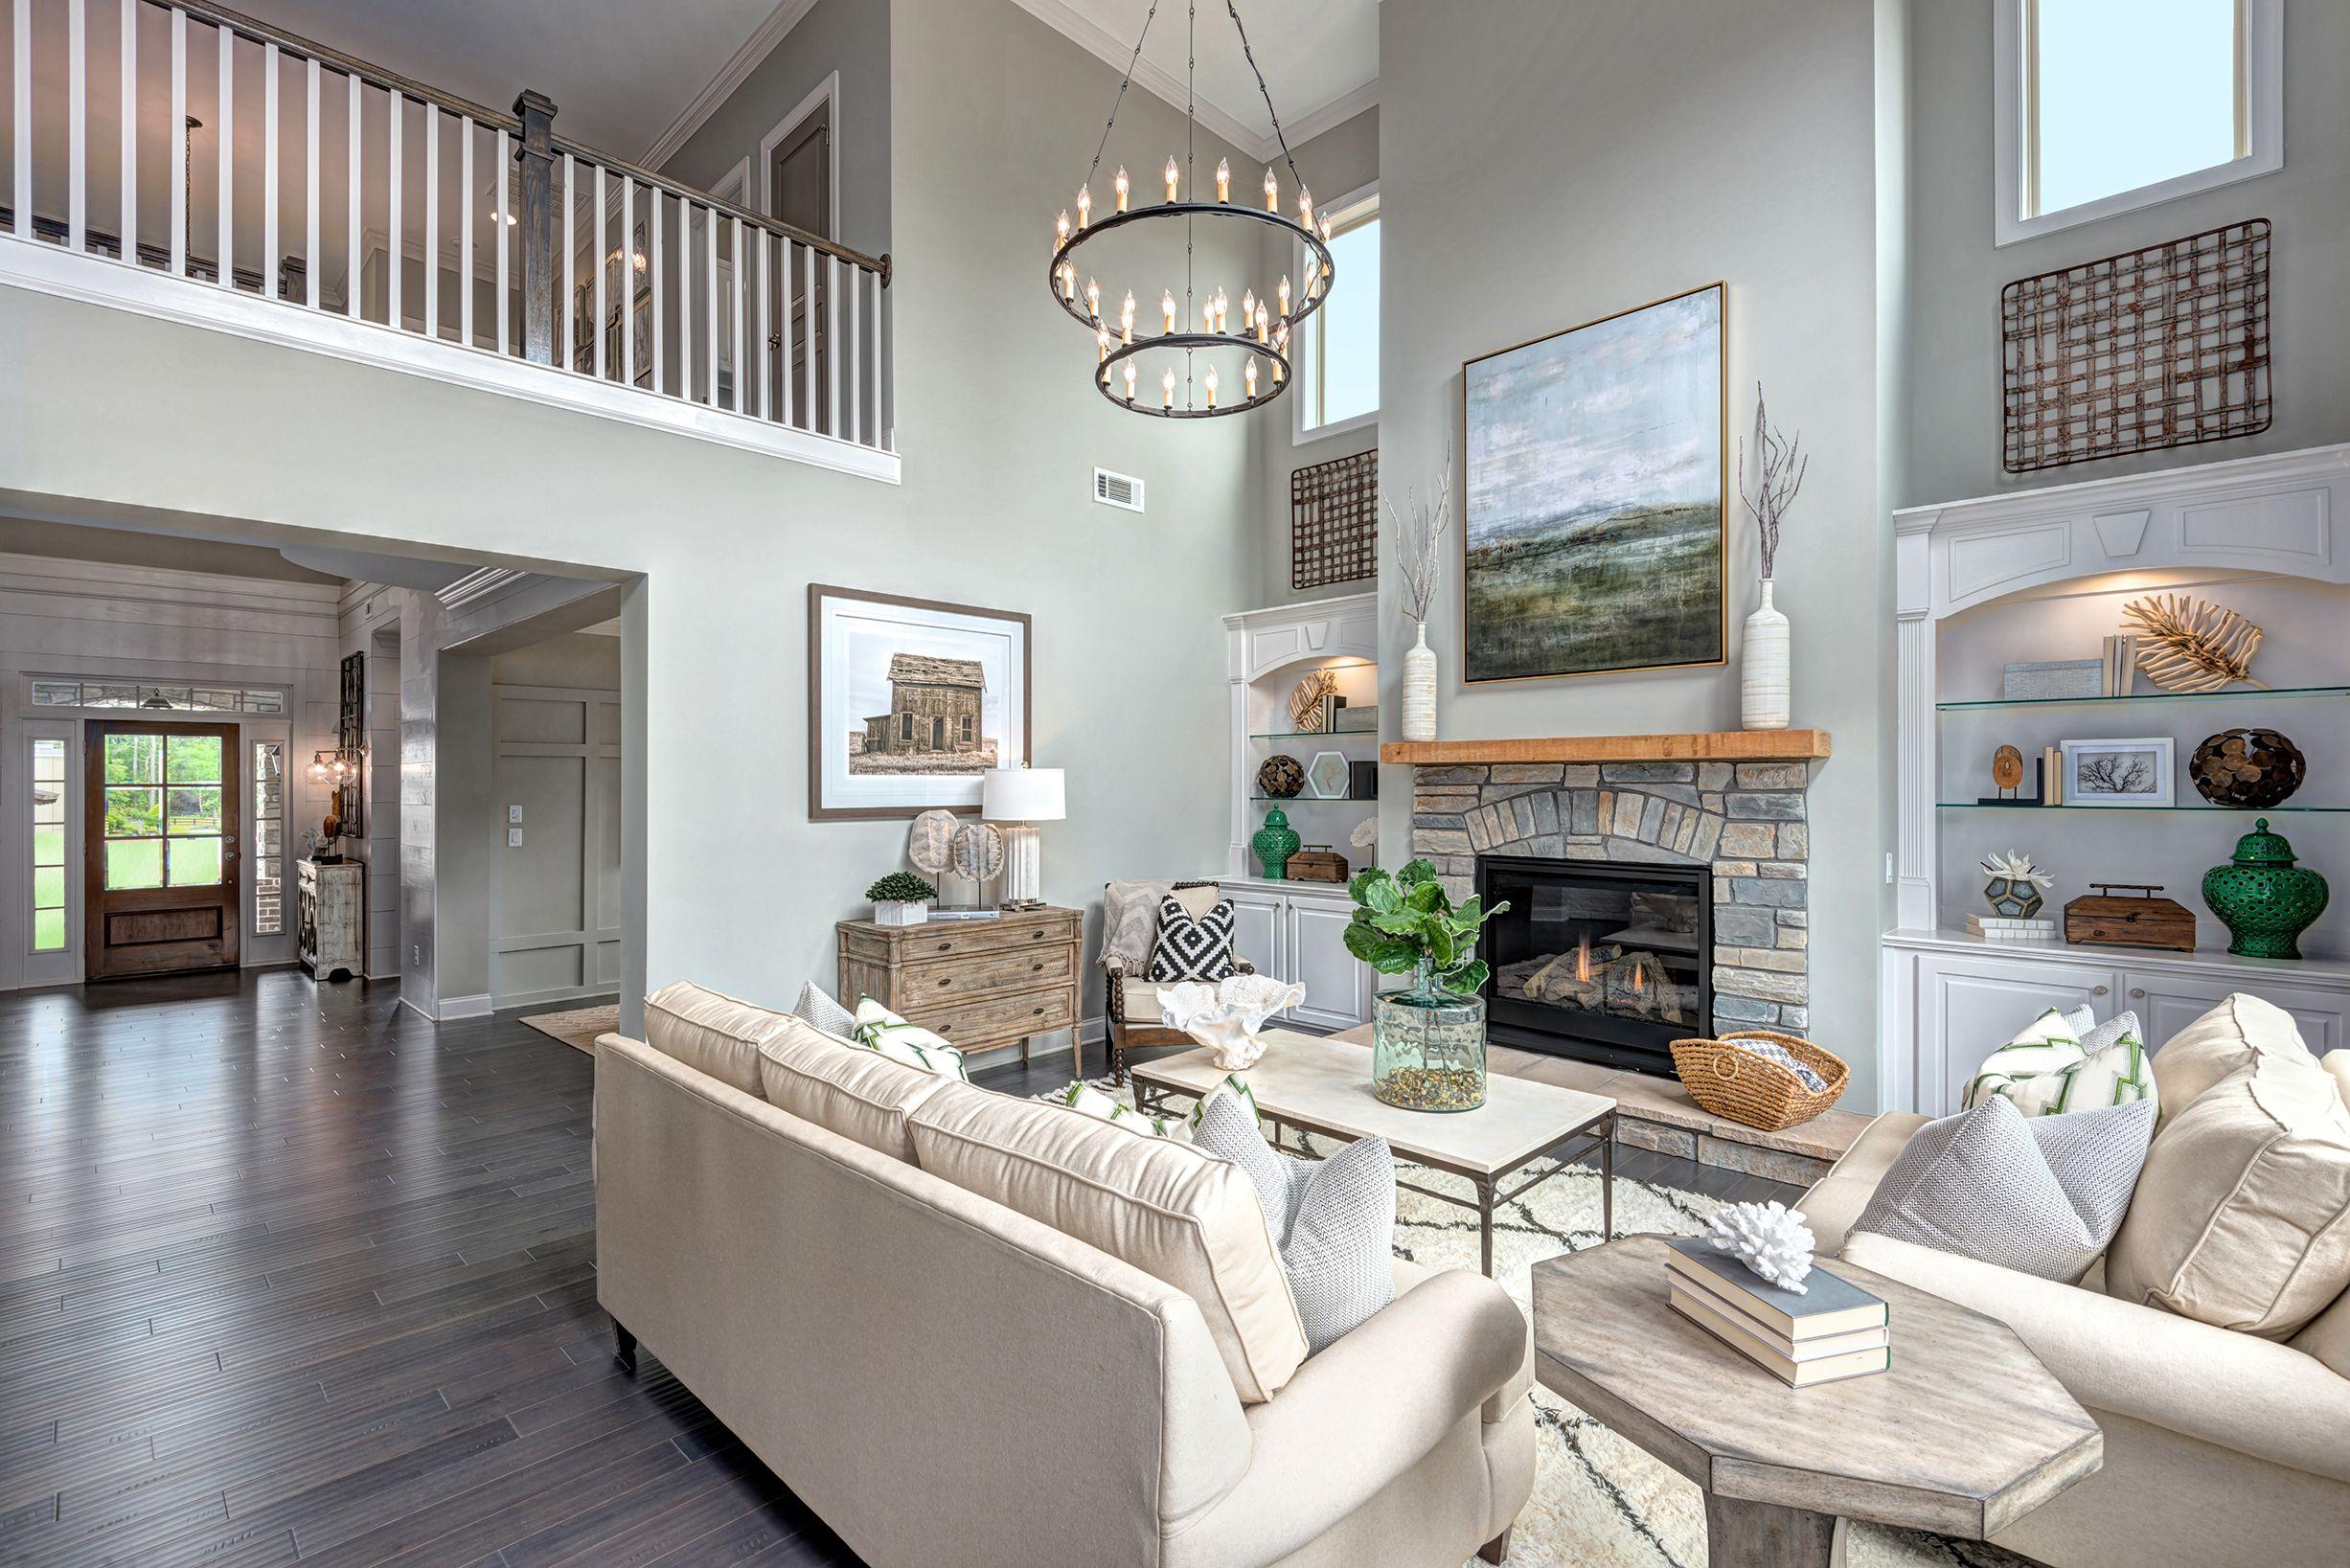 Calatlantic Homes Atlanta Ga Model Home Merchandising Haven Design Works Home New Homes For Sale New Homes